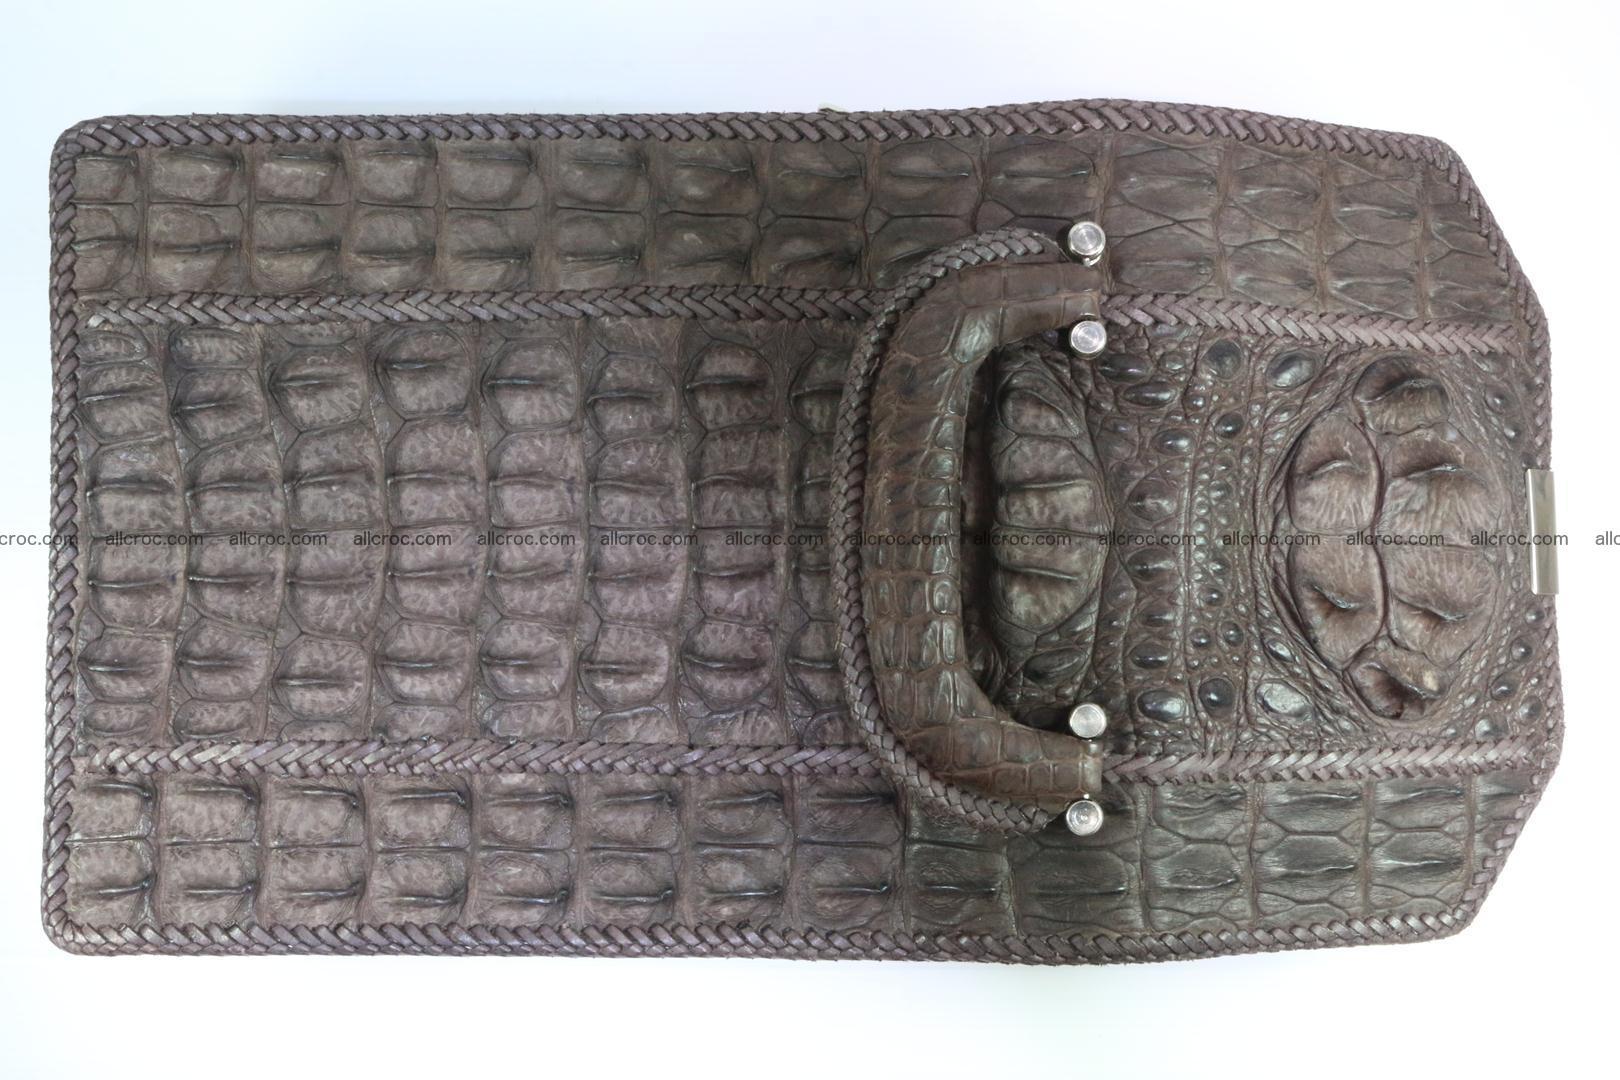 Crocodile skin messenger bag braided edges 421 Foto 6